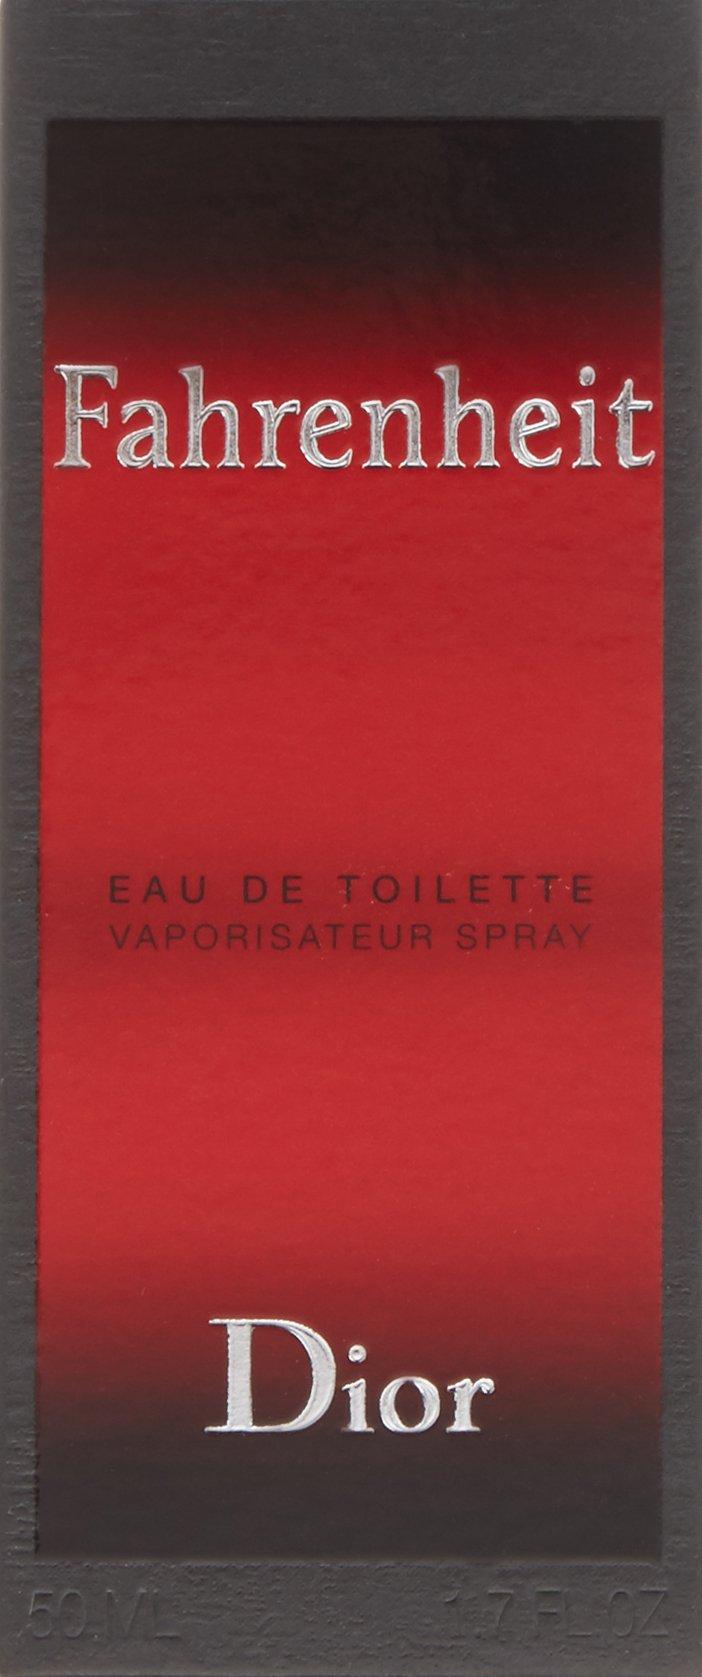 Fahrenheit By Christian Dior For Men. Eau De Toilette Spray 1.7 Ounces by Dior (Image #3)